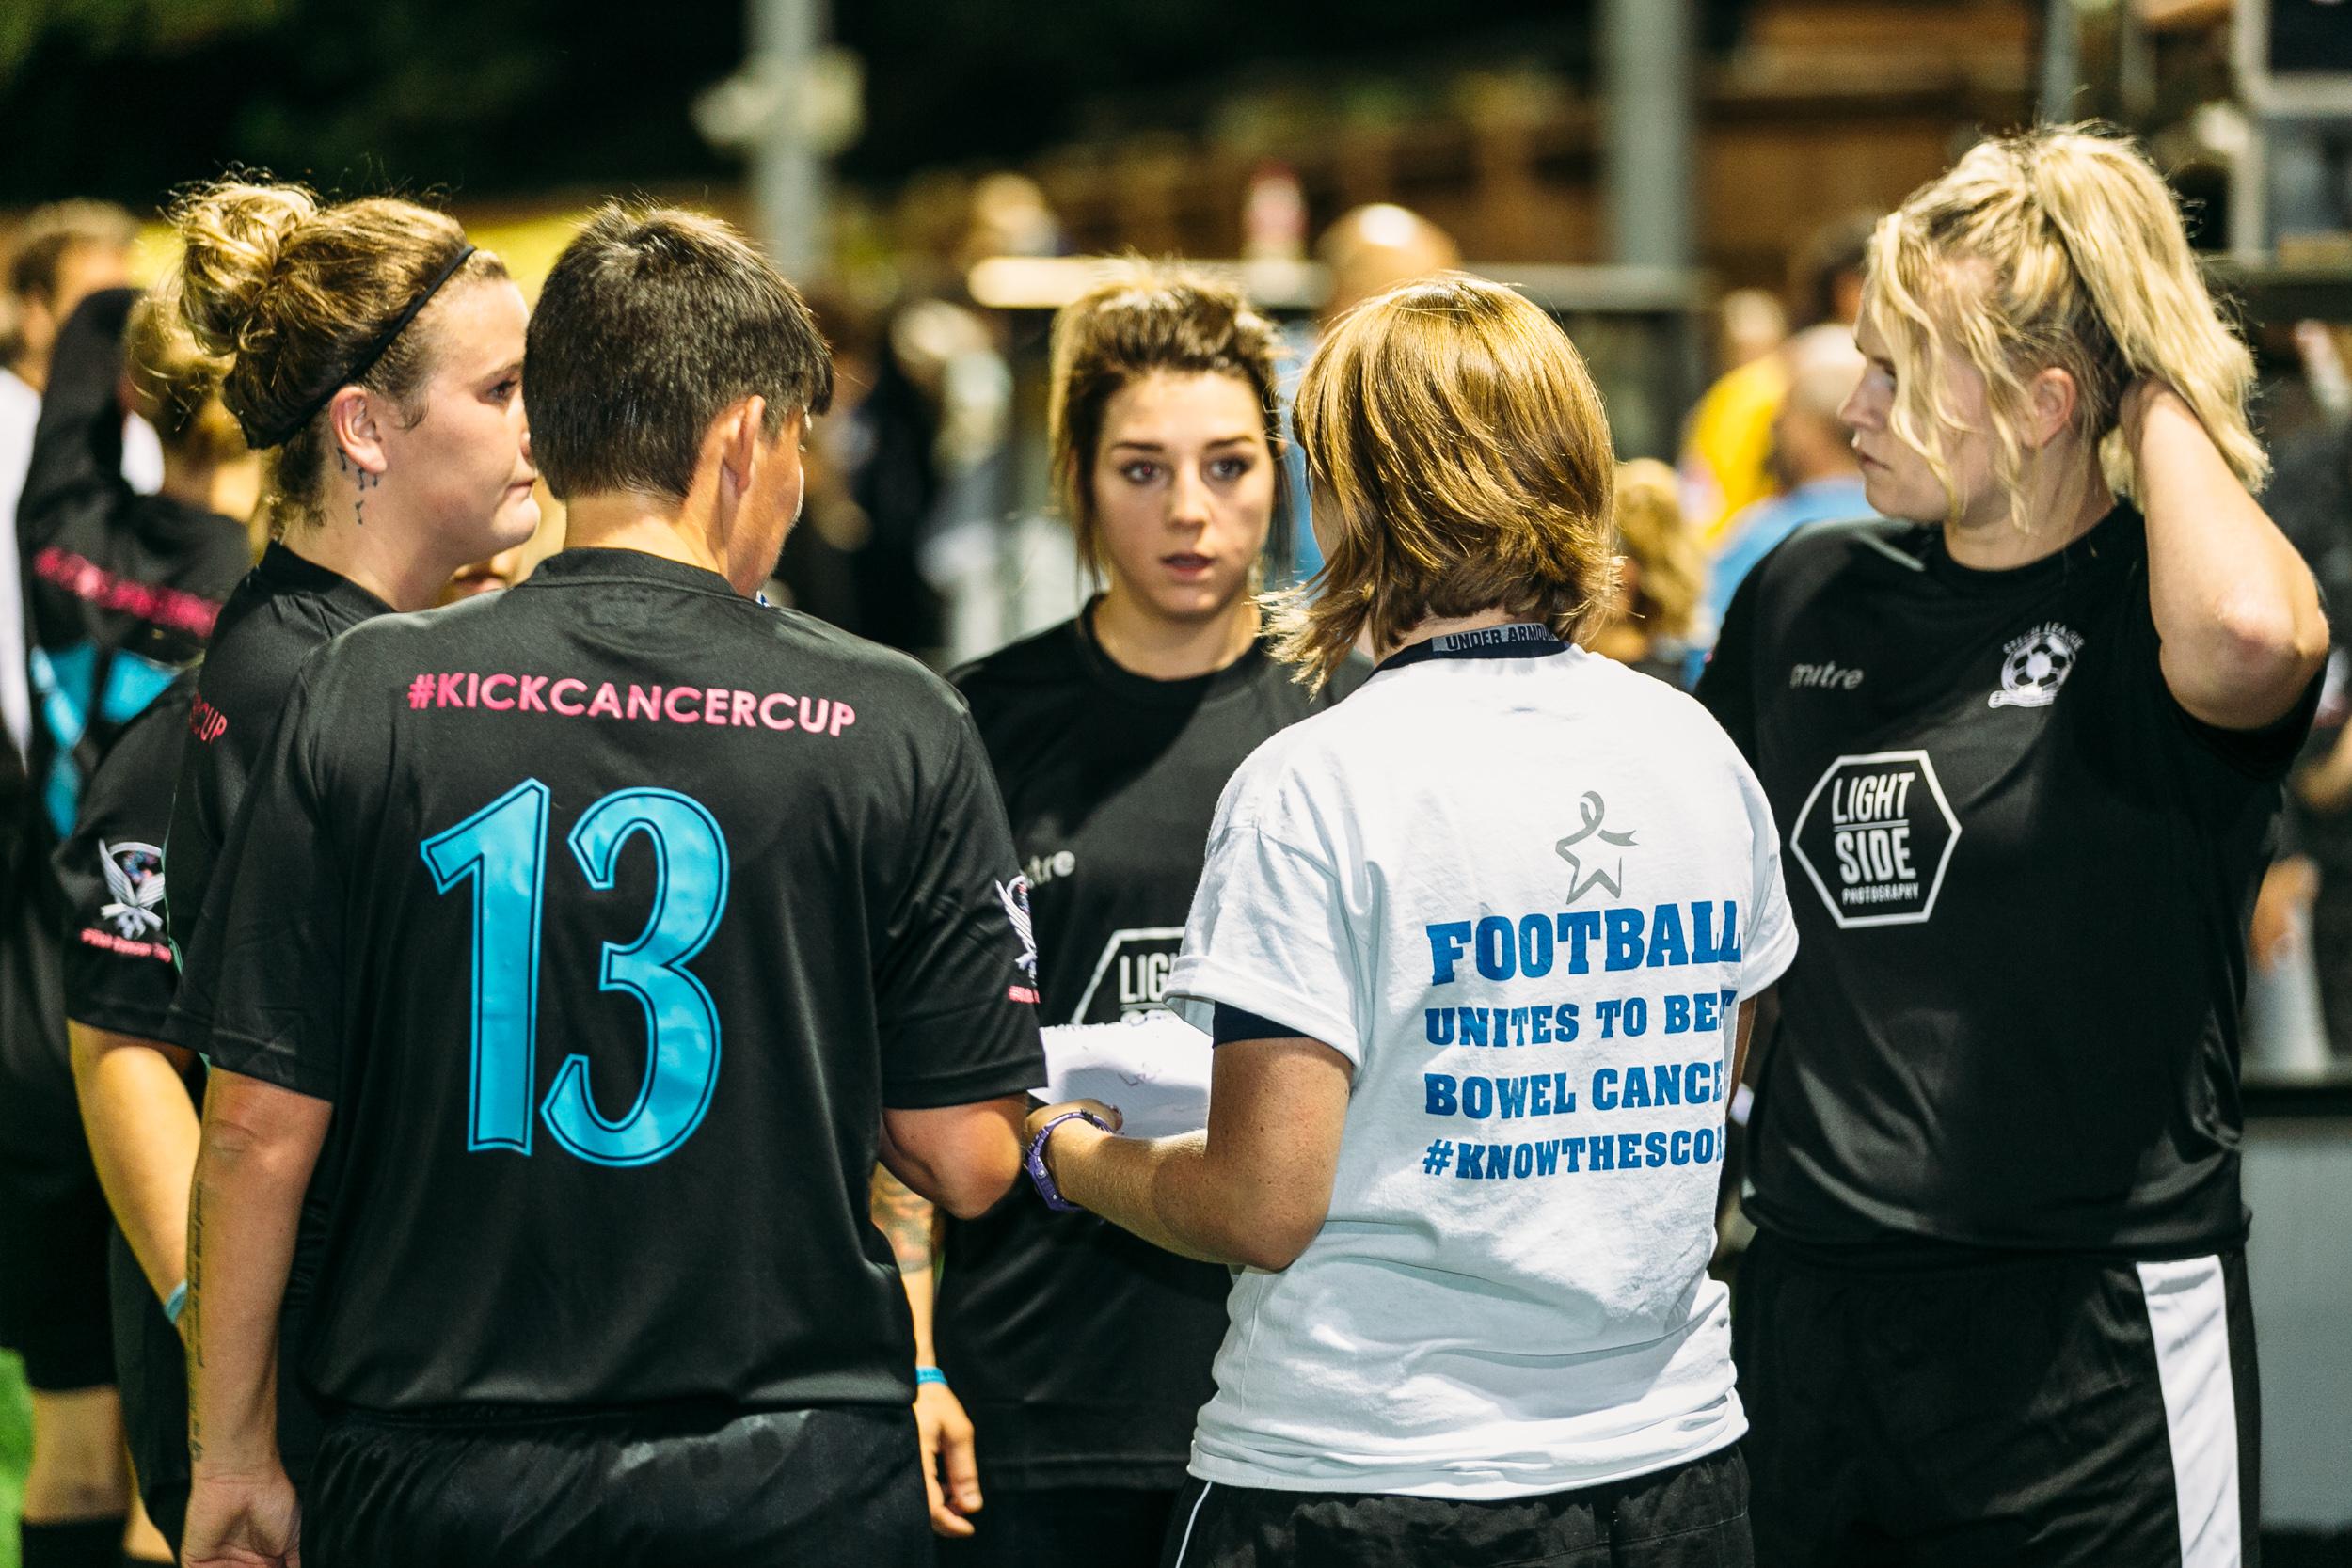 Kick Cancer Cup, Cambridge, 2016